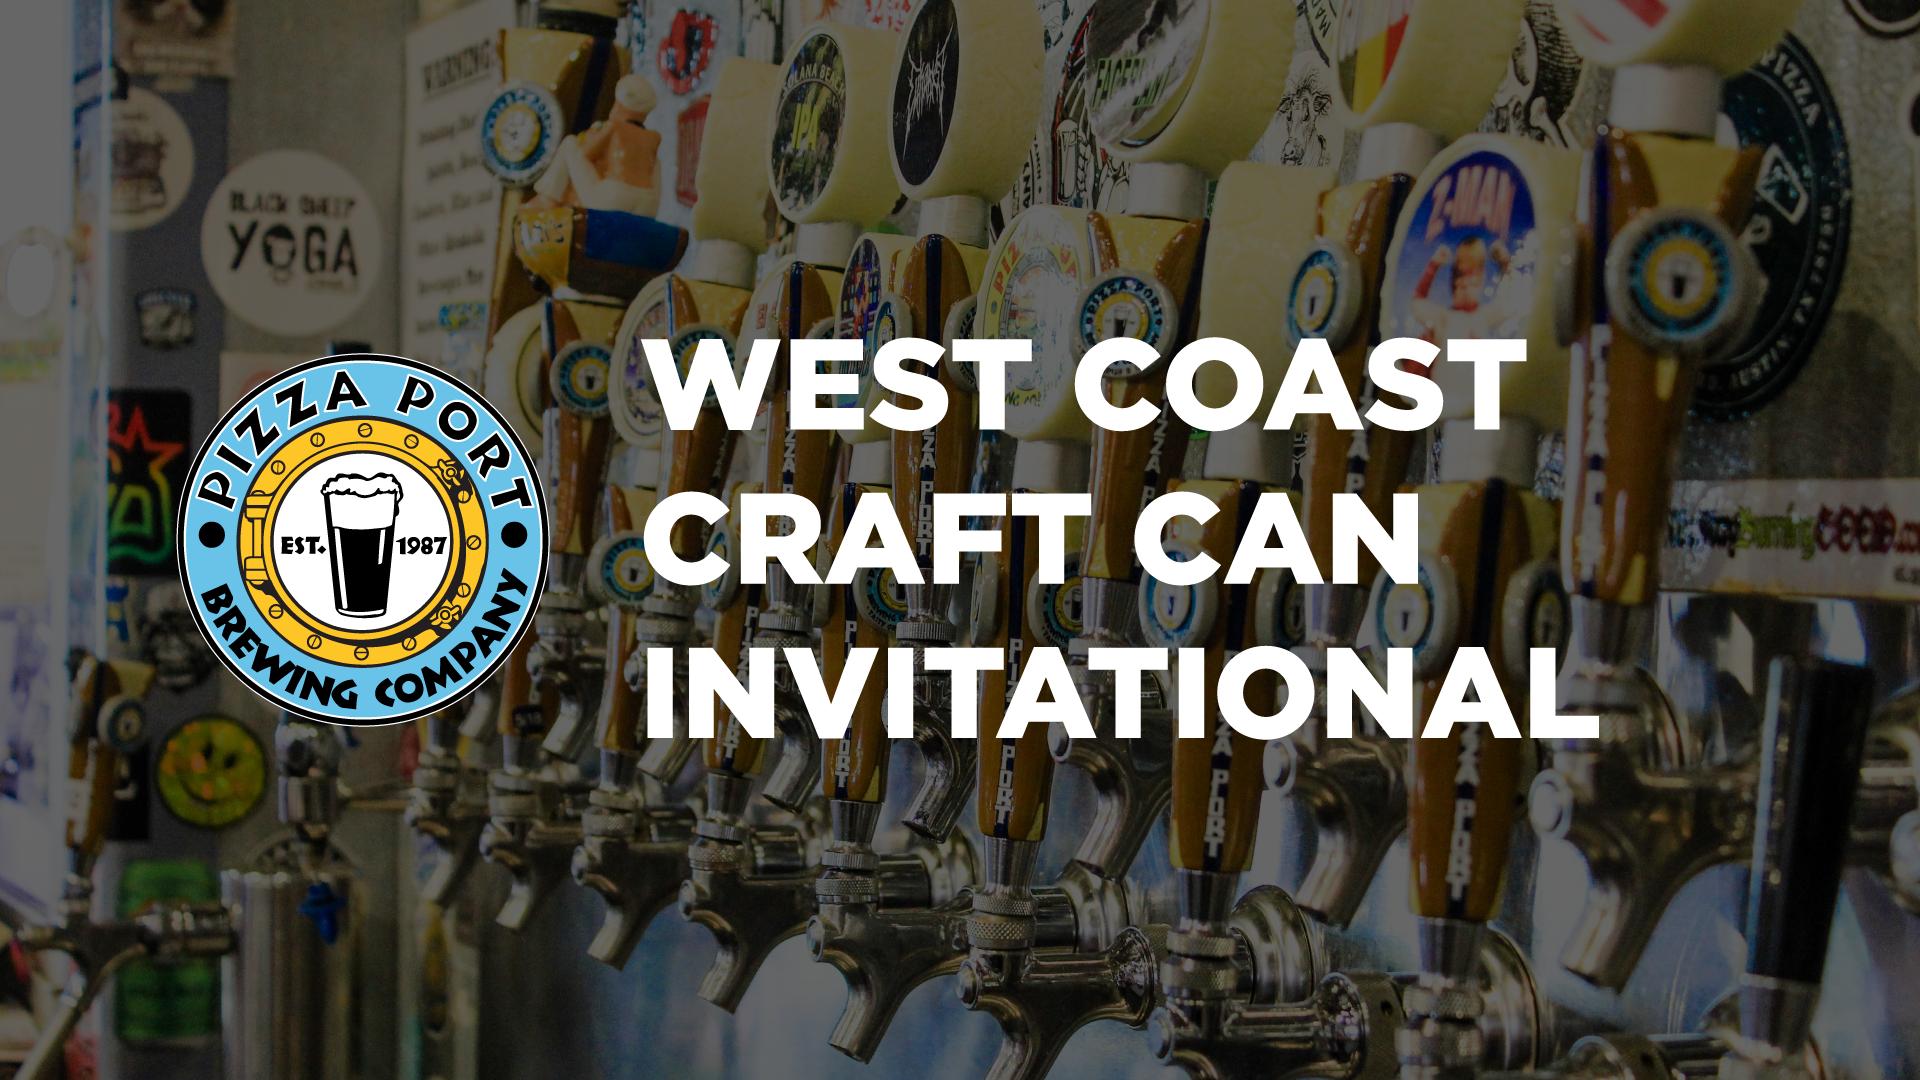 West Coast Craft Can Invitational